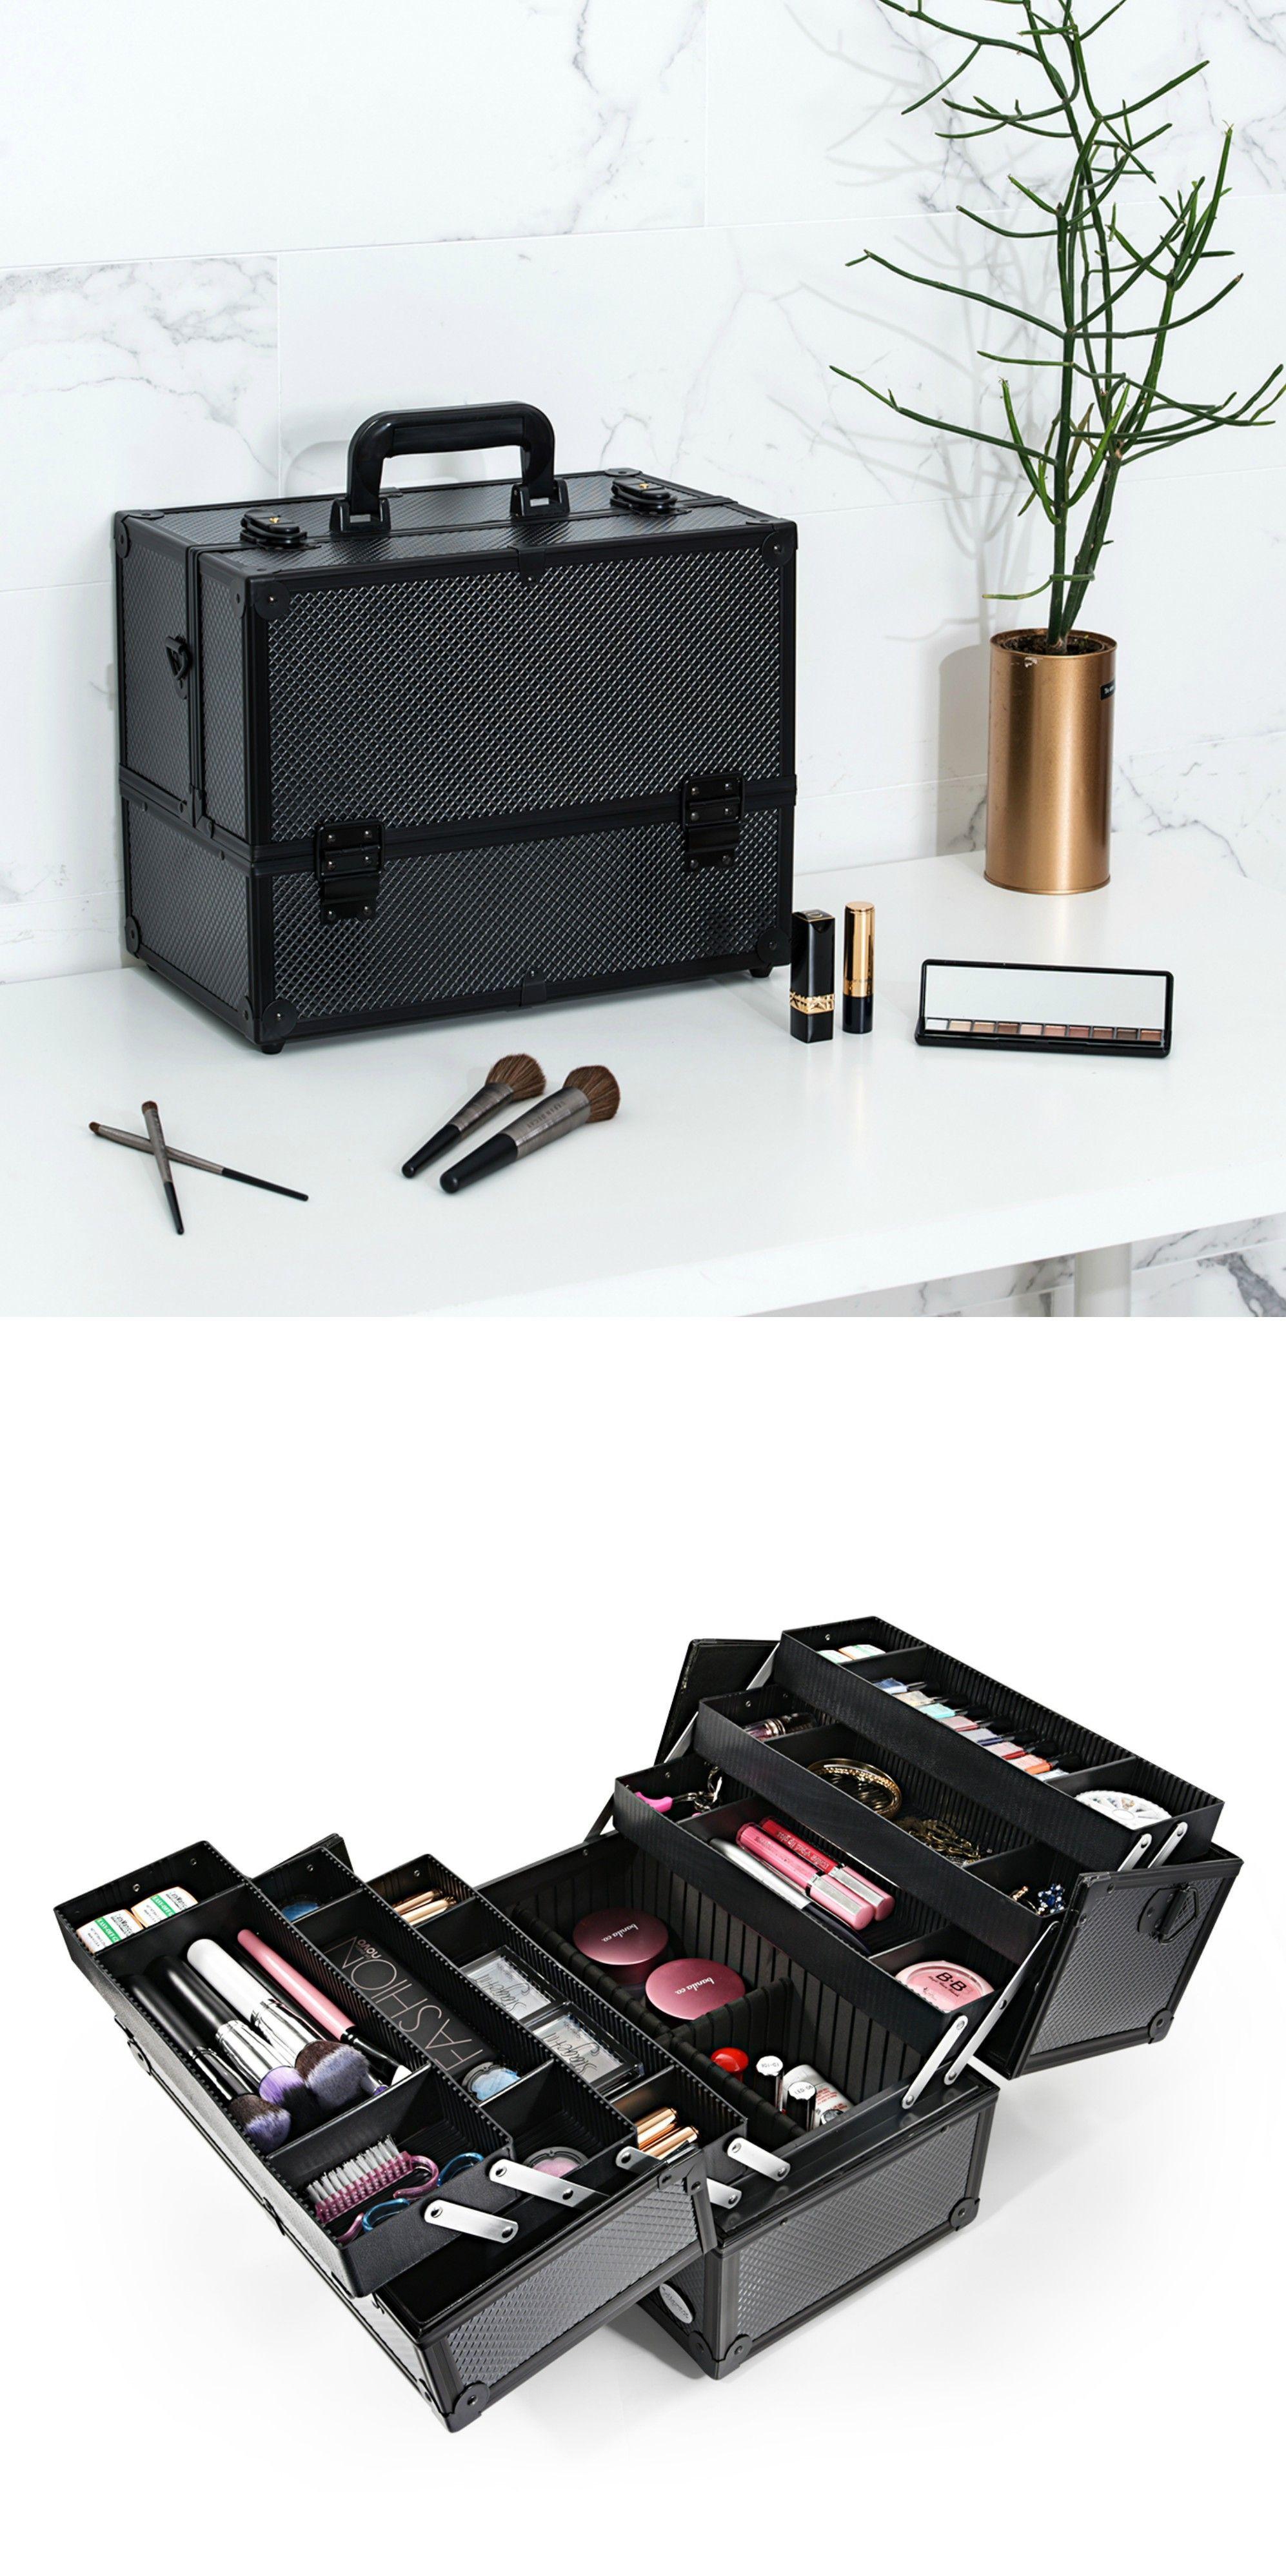 Black Diamond Professional Makeup Train Case with Four Tire Dividing Tray--Joligarce Artis makeup case / Makeup vanity with storage / Best makeup case Big ...